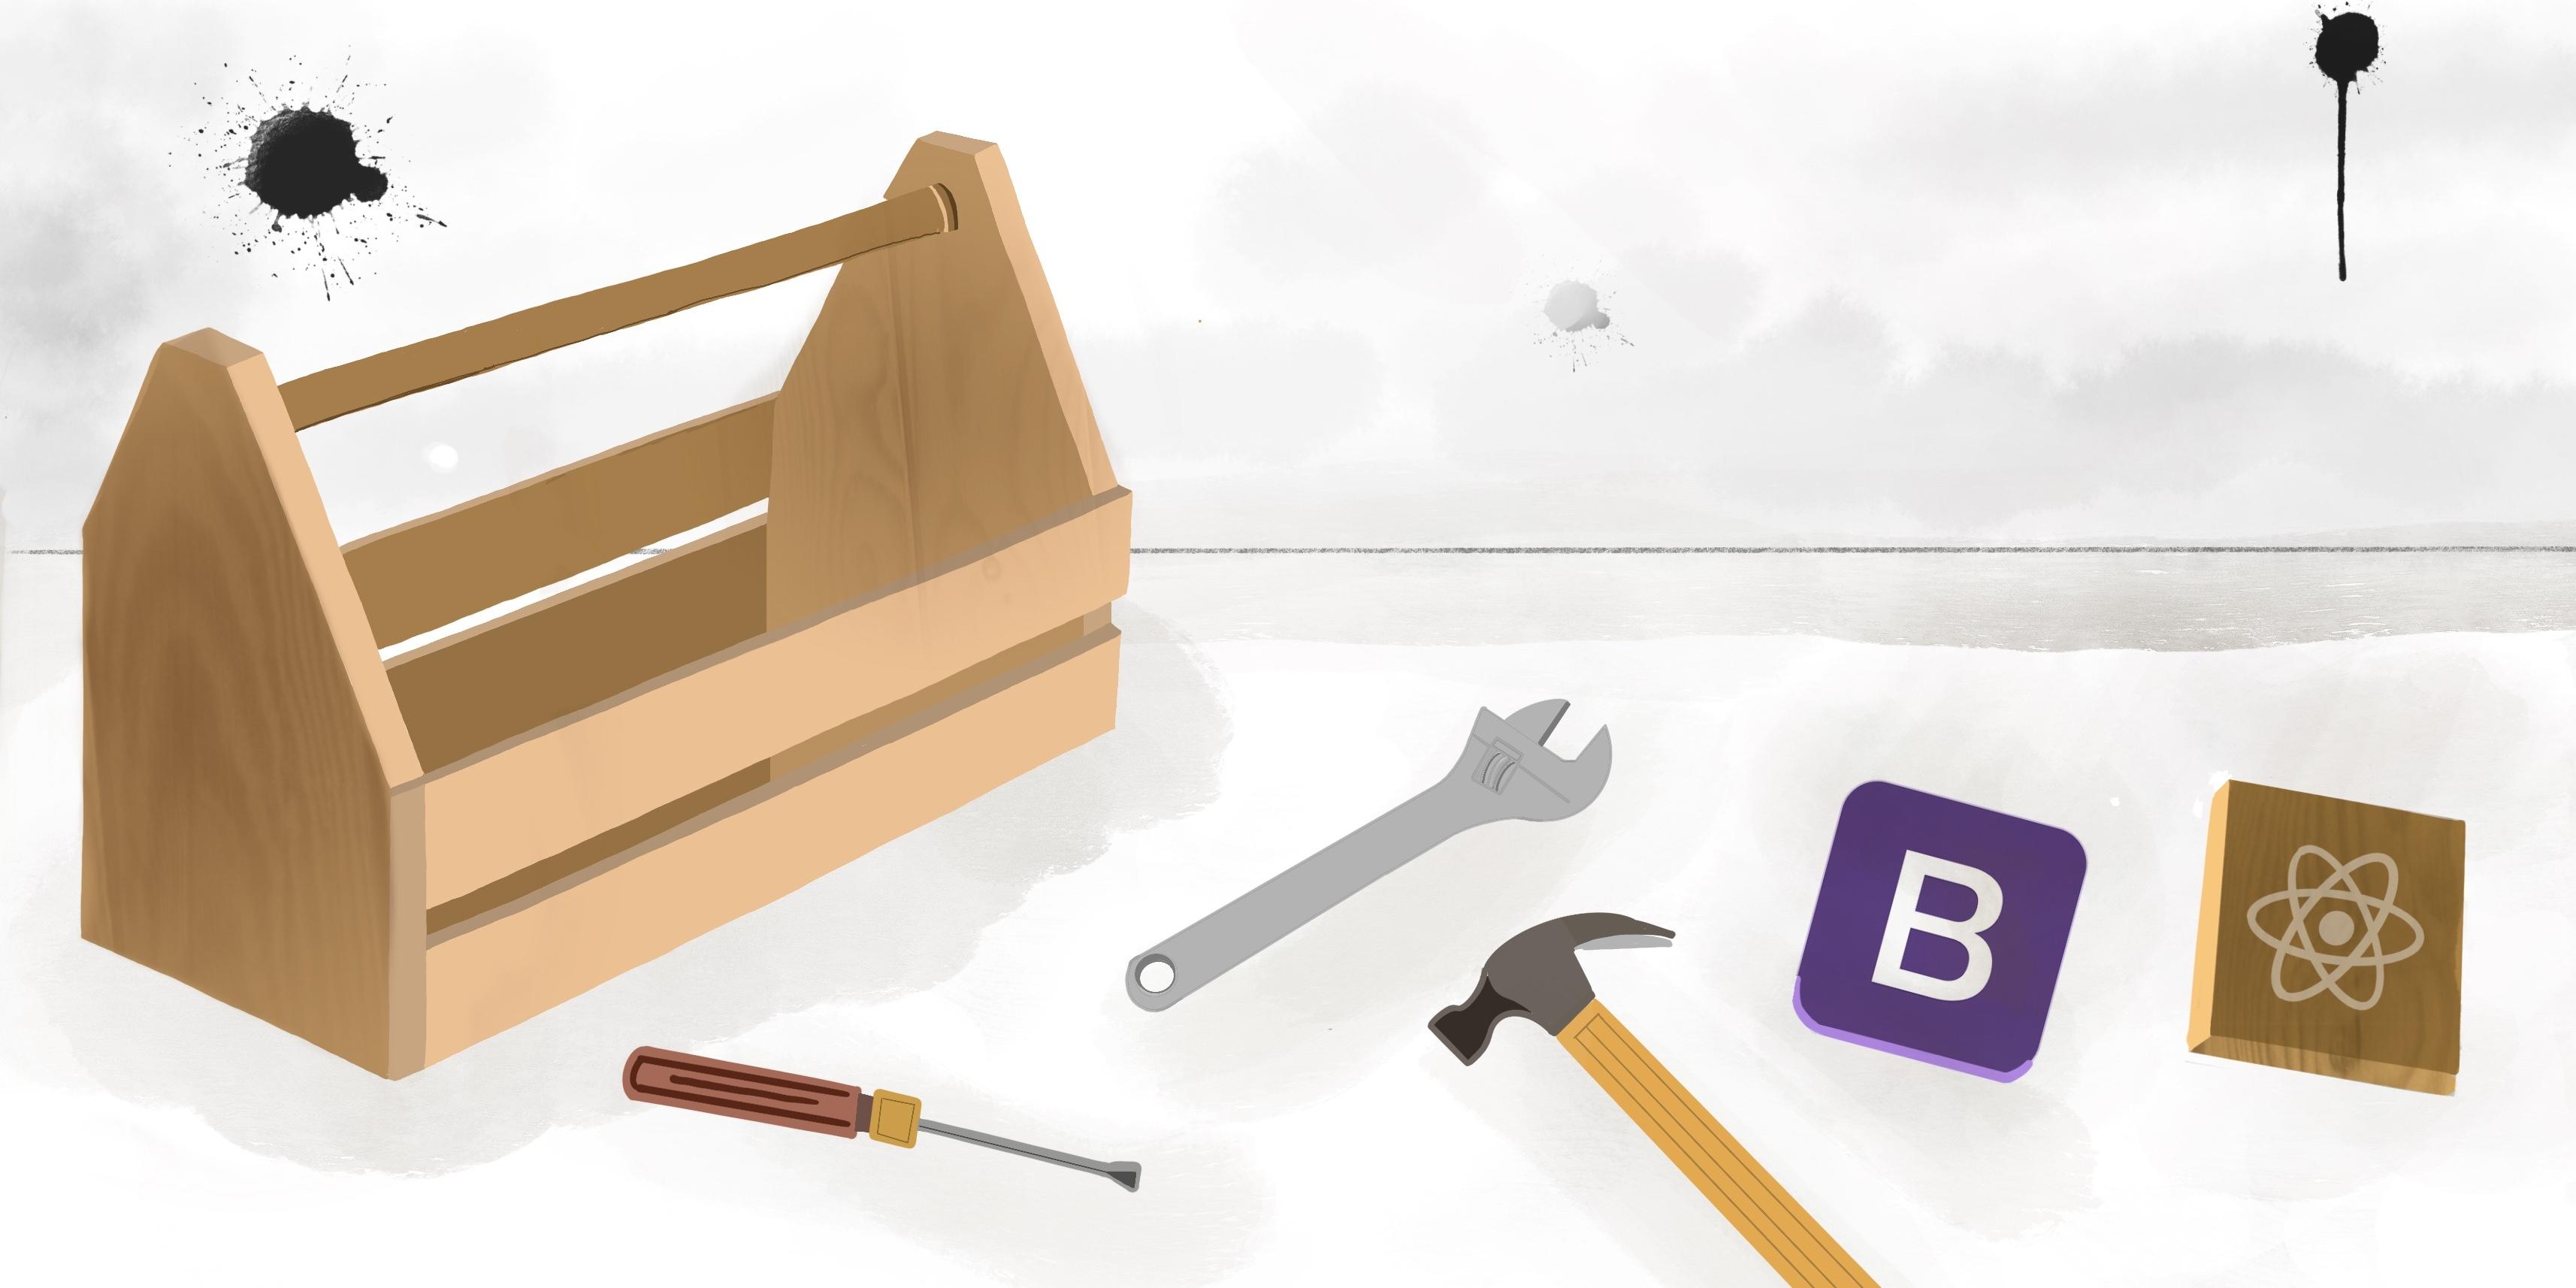 Toolbox Frameworks